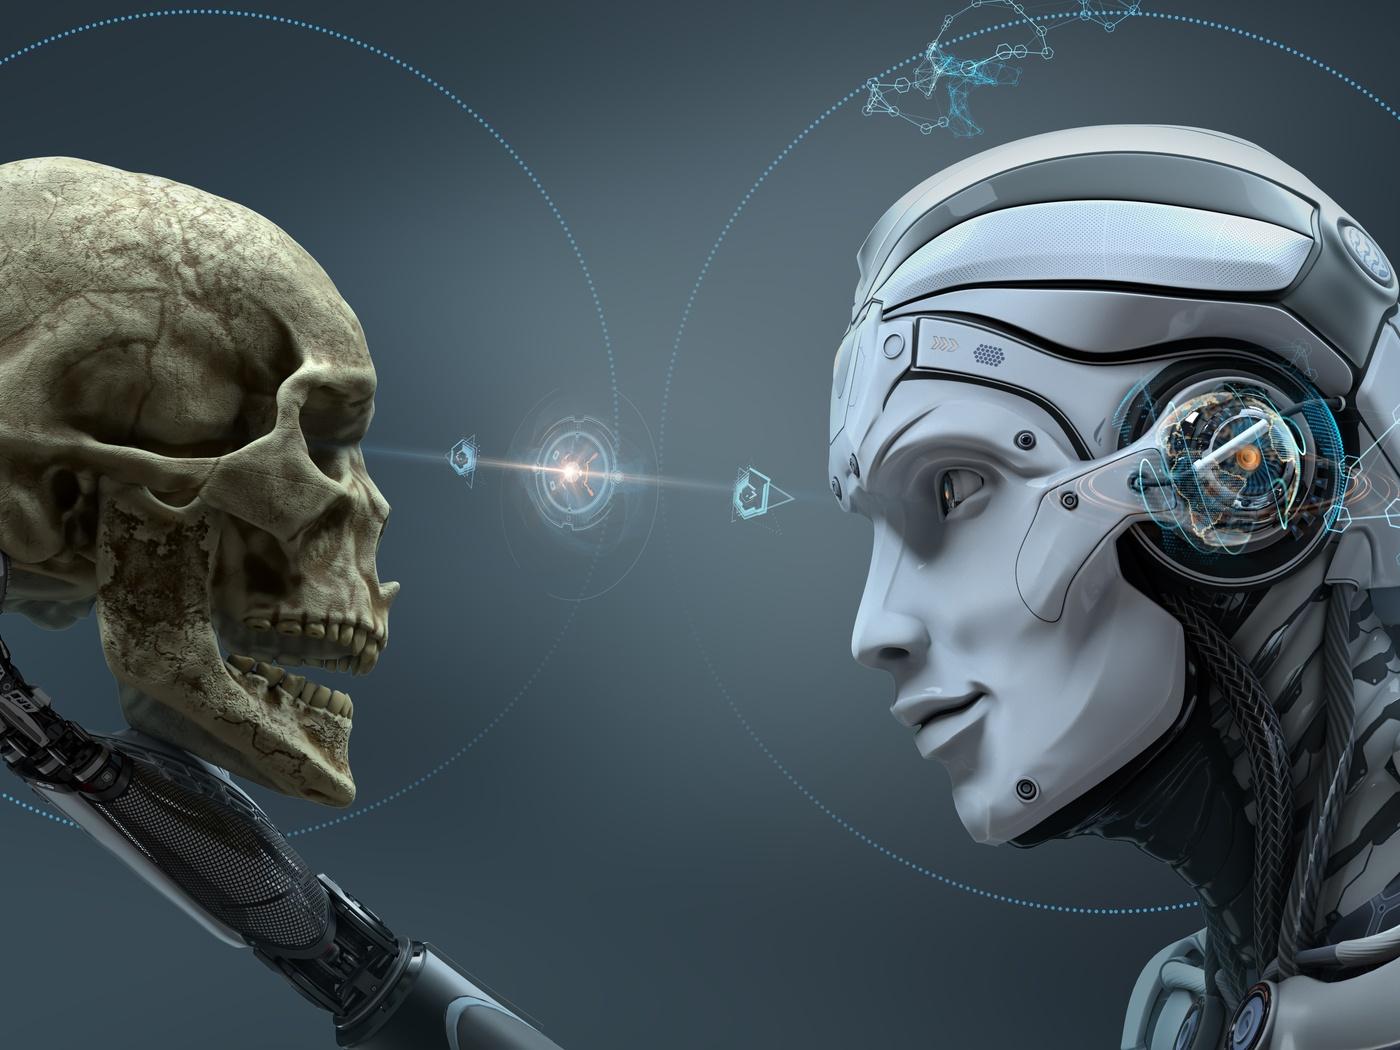 skull-machine-robot-4h.jpg